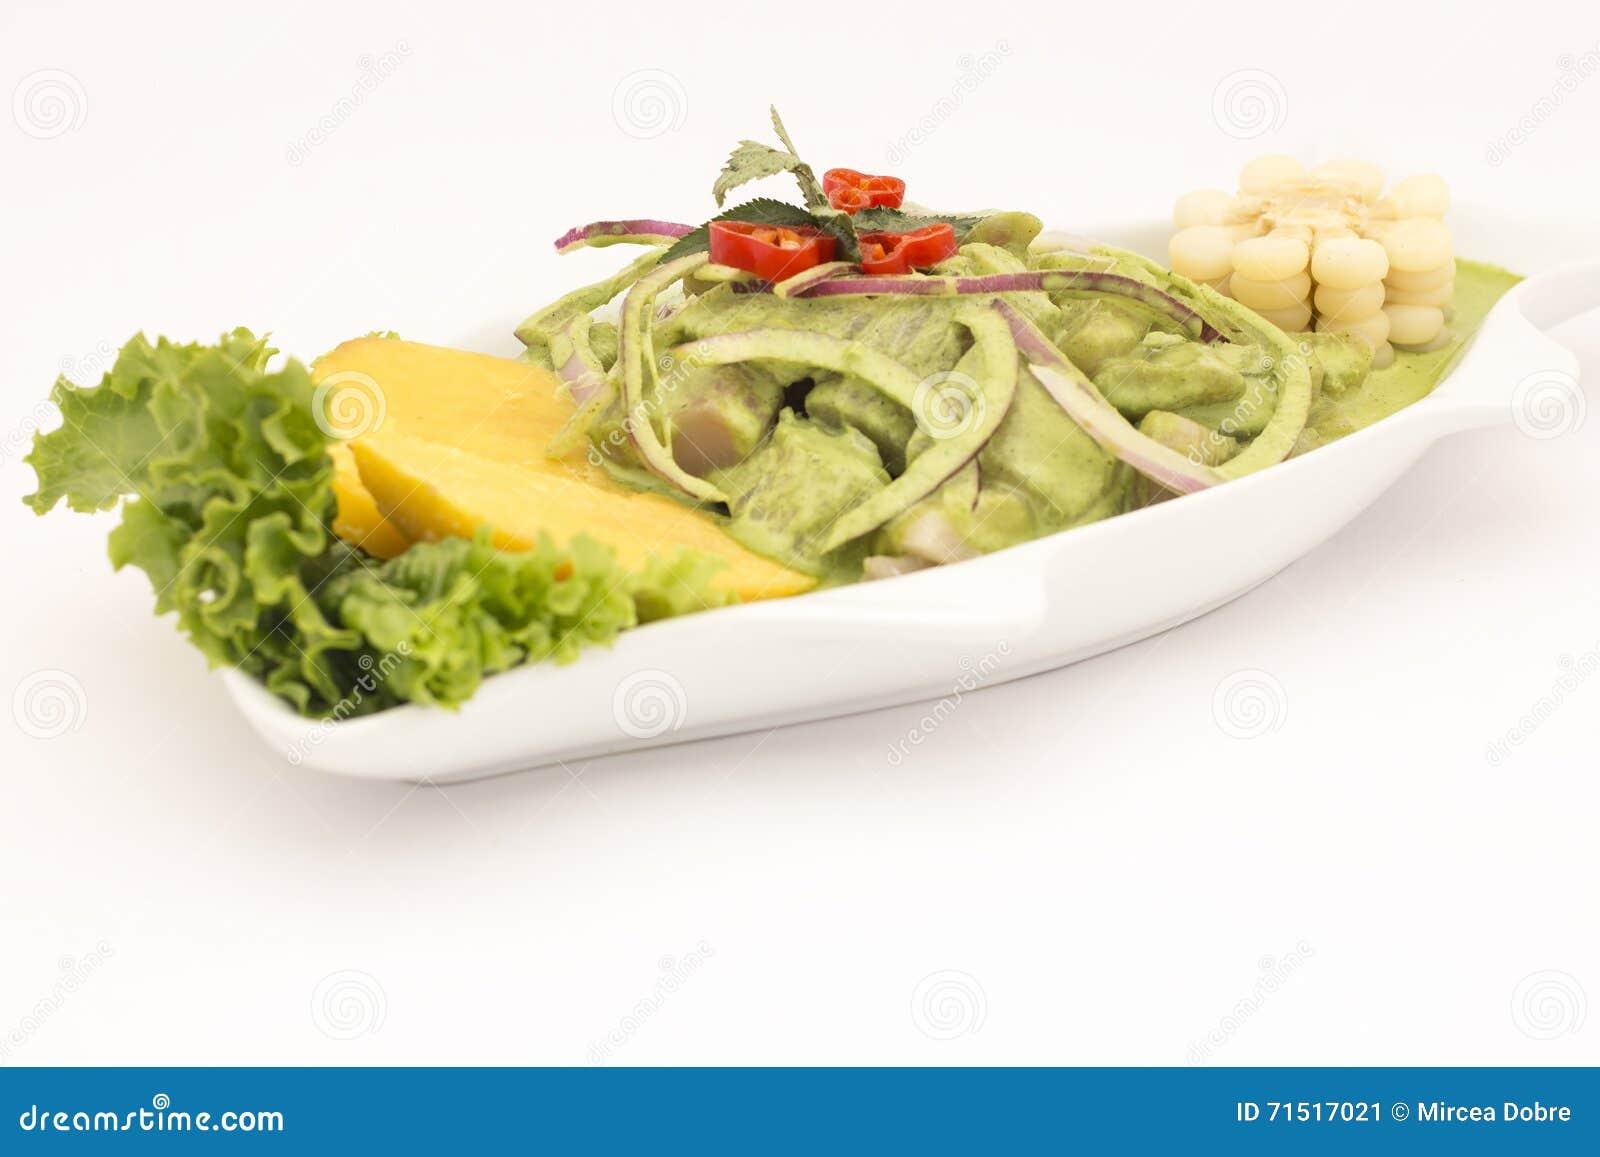 Peru Dish: En Crema Andina de Cebiche (ceviche) Manjericão, coentro, peixe fresco, suco de limão, cebola, potatoe doce, camote